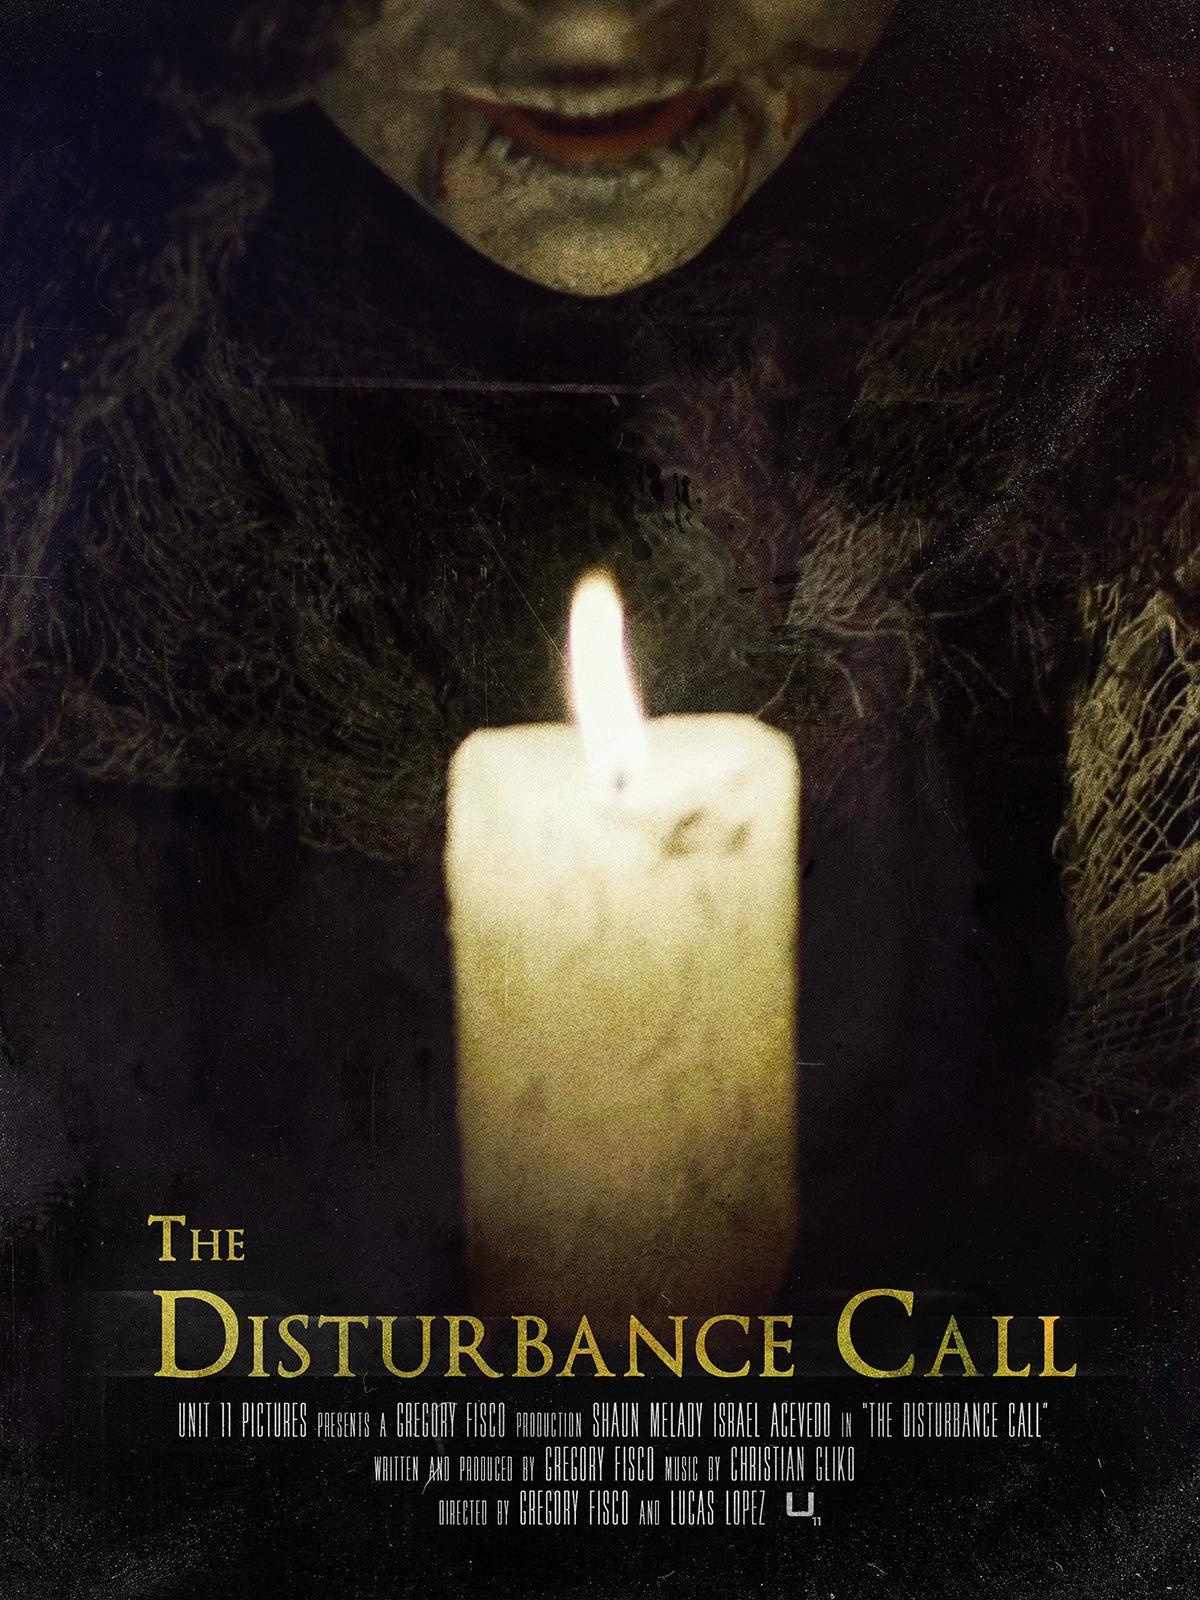 The Disturbance Call